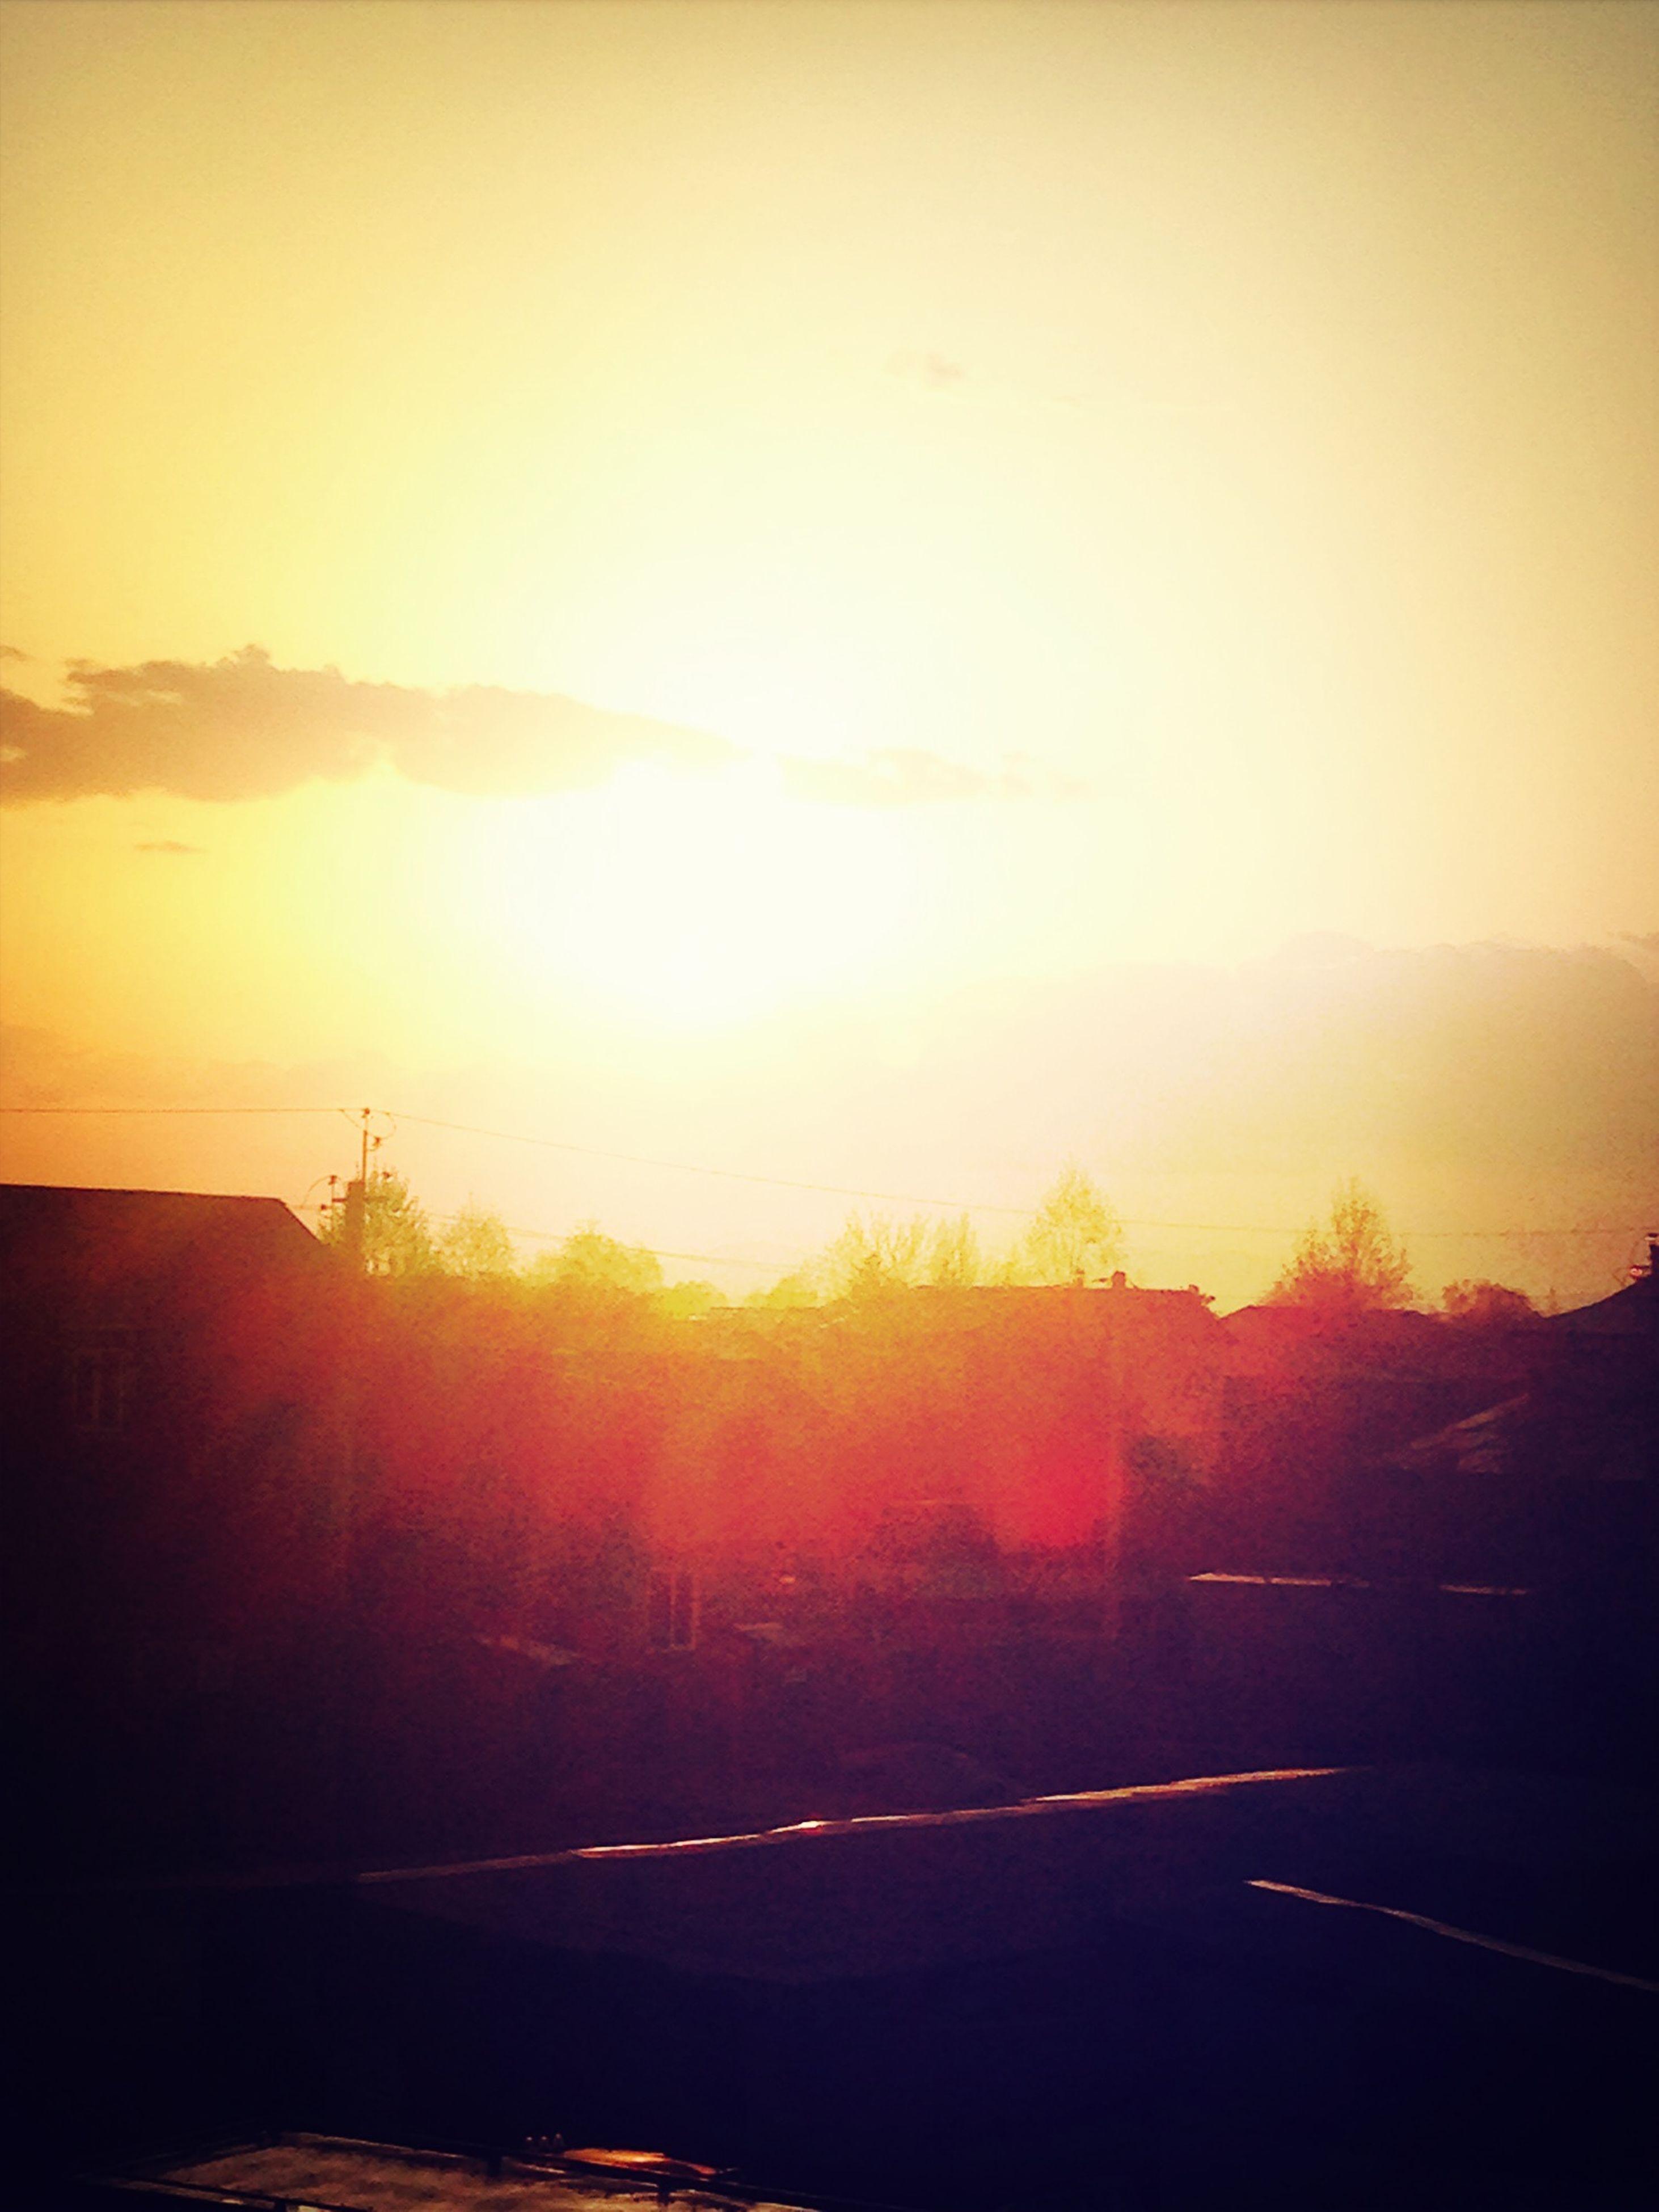 sunset, sun, silhouette, orange color, sky, sunlight, scenics, tranquility, tranquil scene, beauty in nature, sunbeam, lens flare, road, nature, transportation, idyllic, tree, landscape, outdoors, back lit